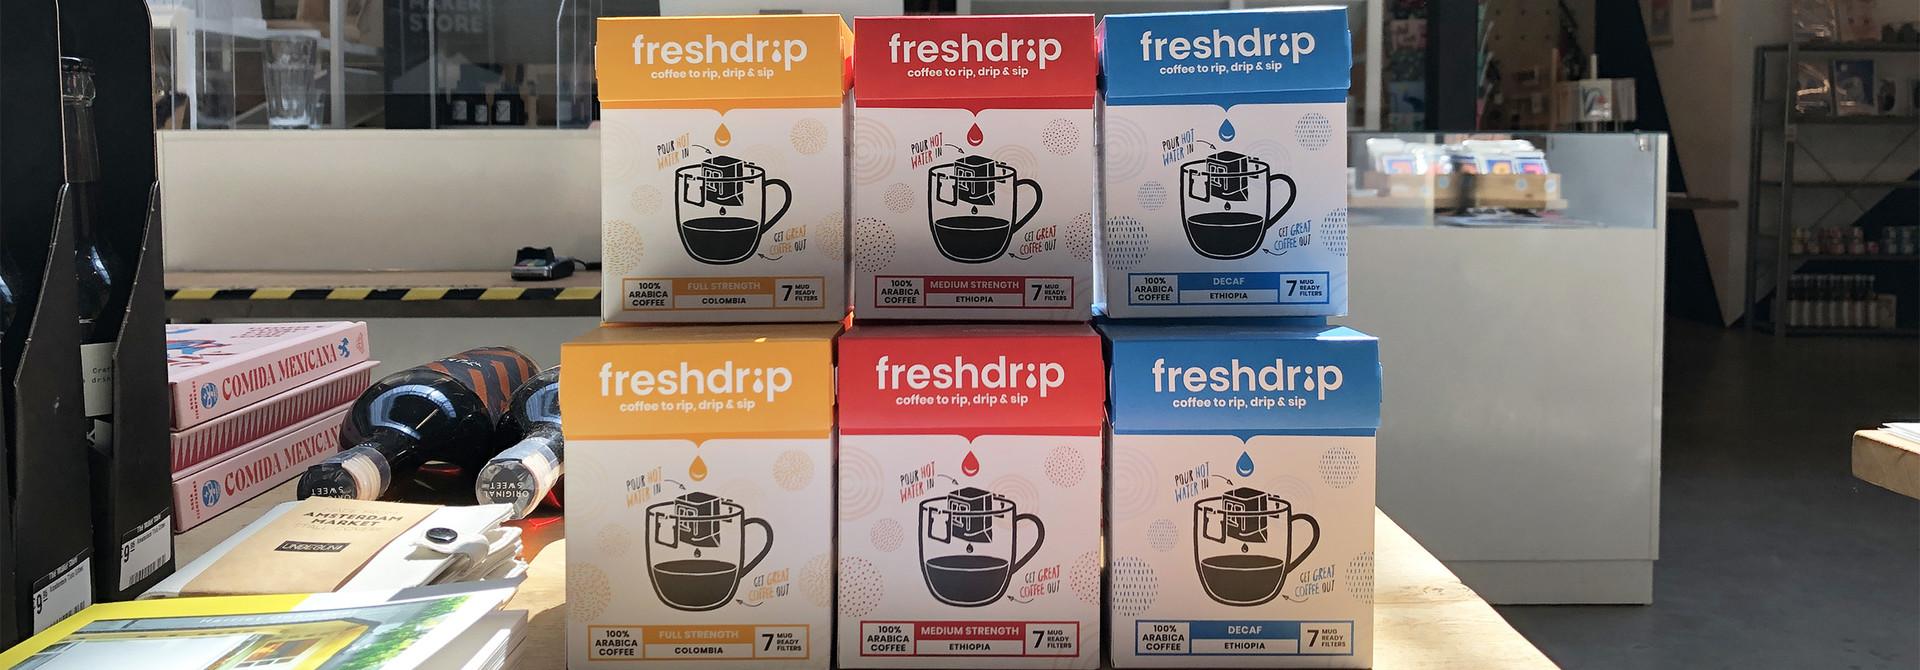 Freshdrip reinvented: meet our new range of drip coffee bags